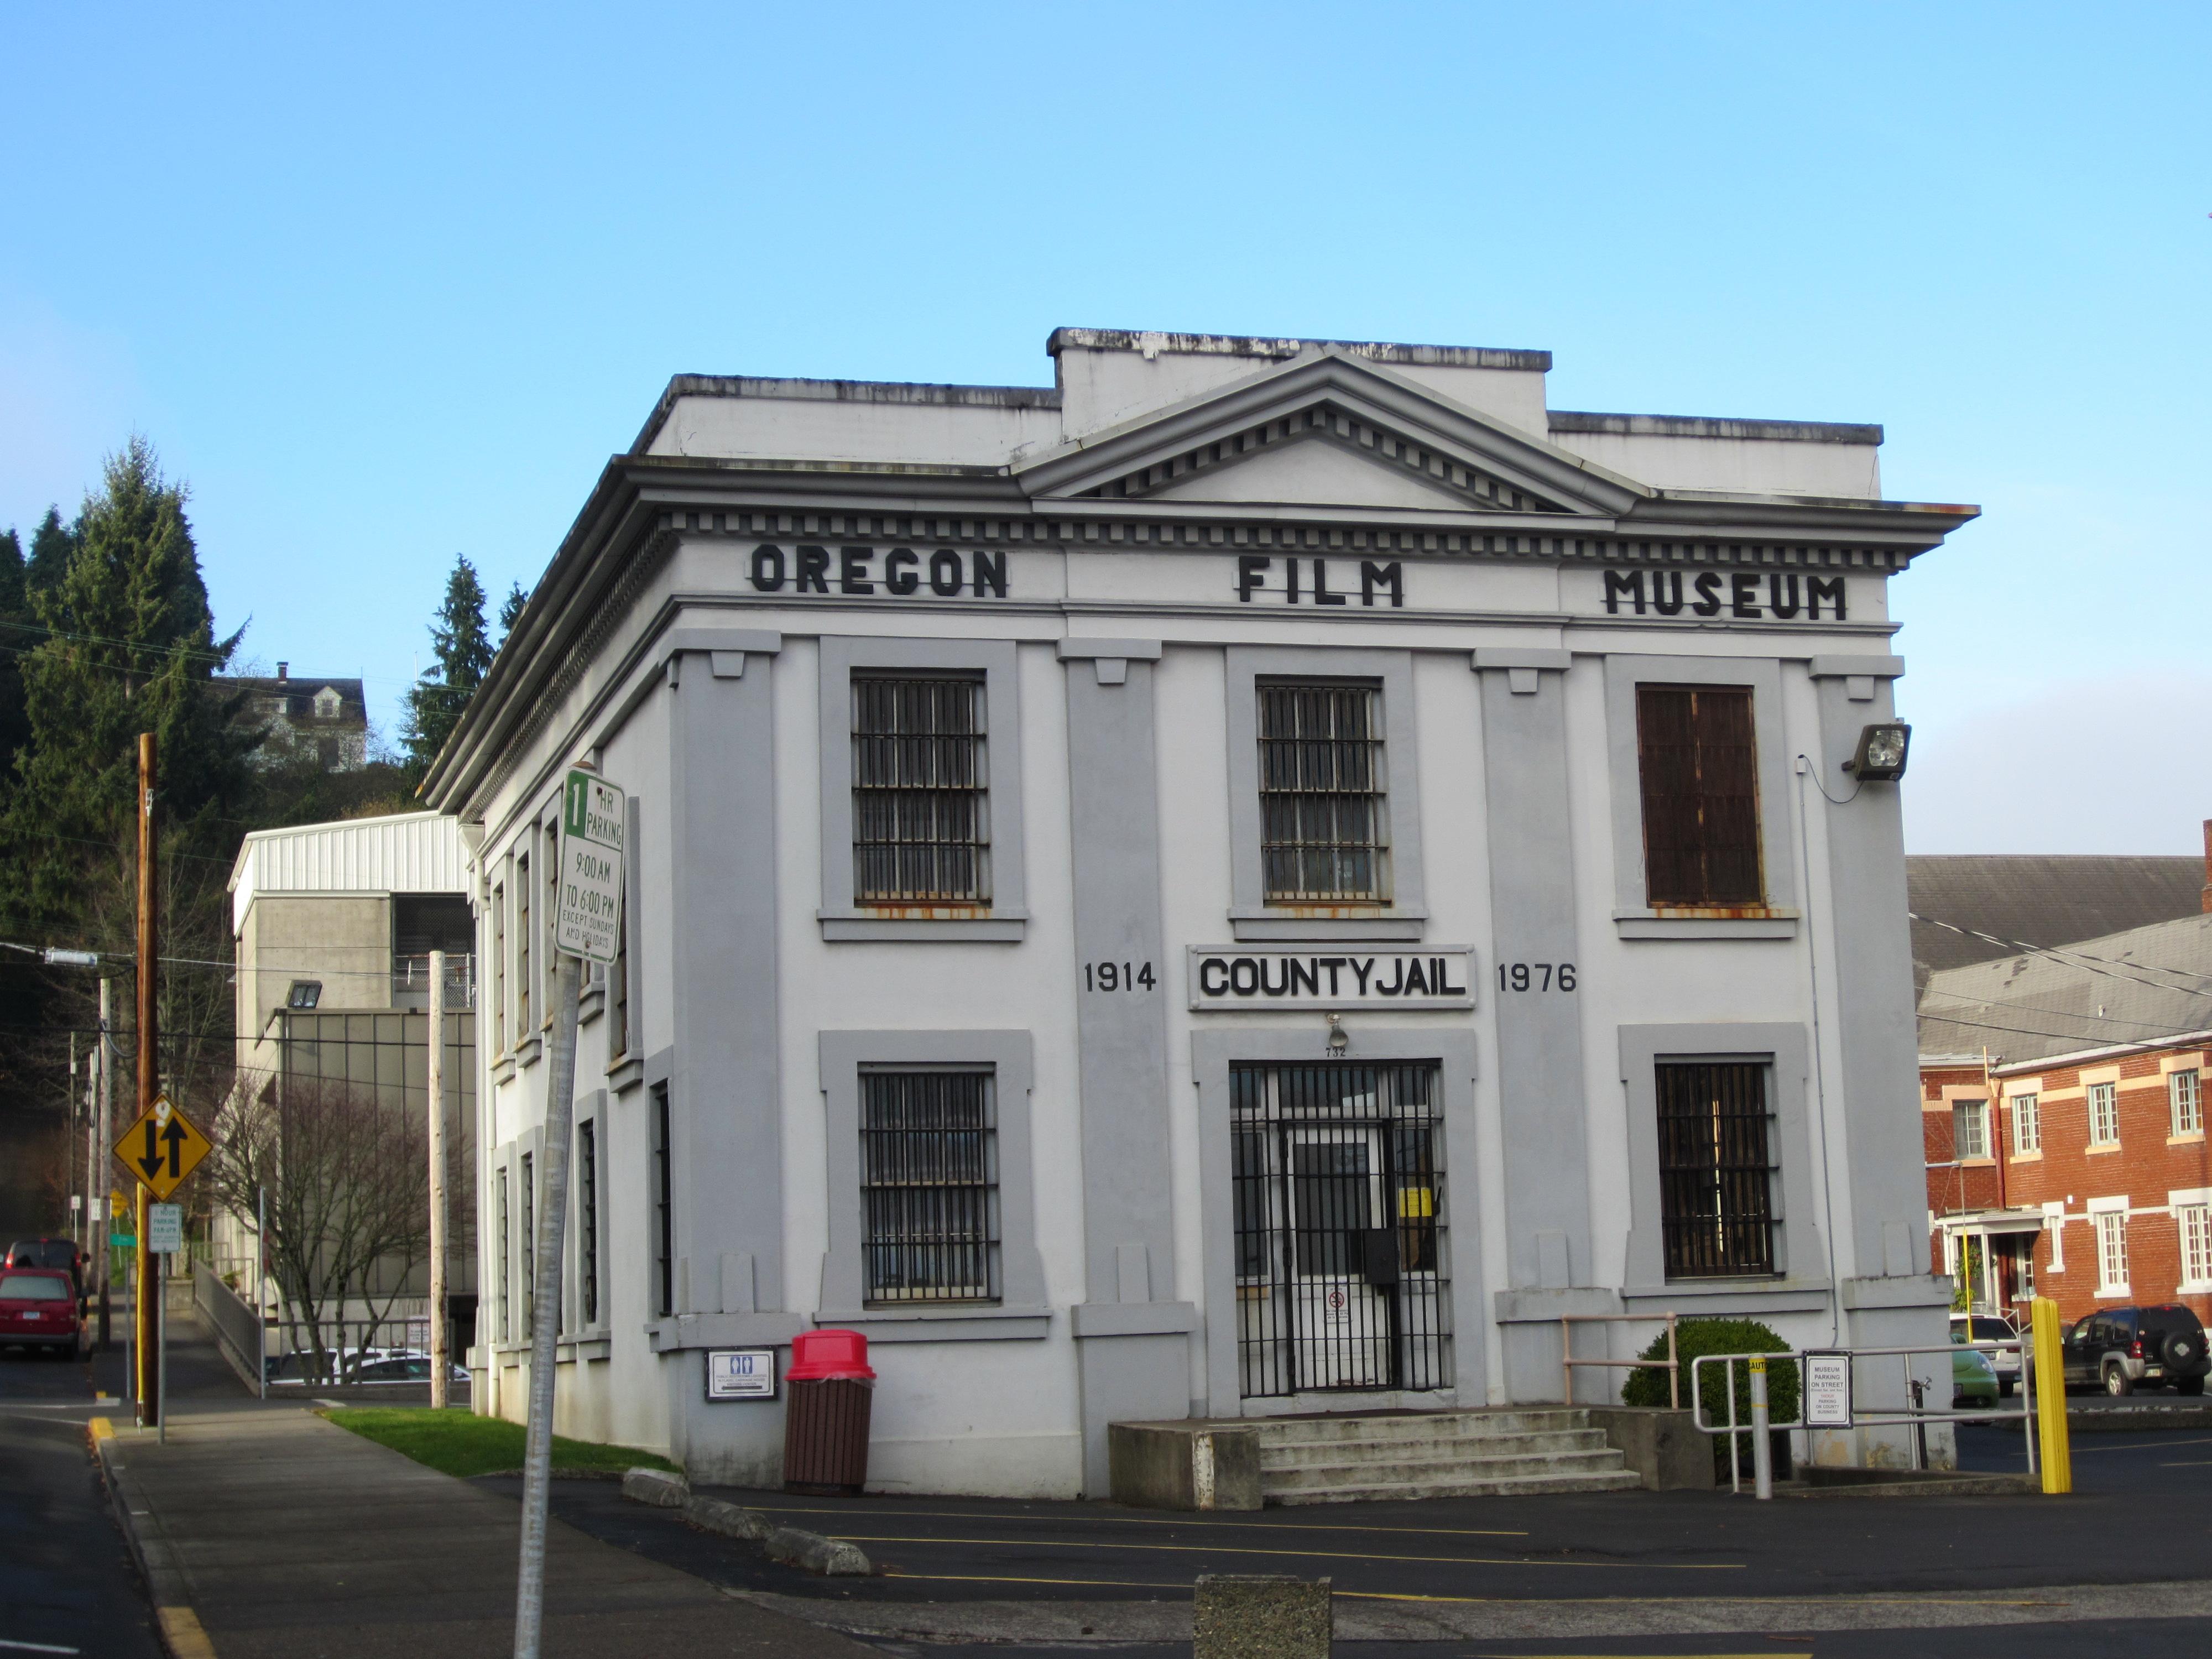 Oregon_Film_Museum,_County_Jail,_Astoria